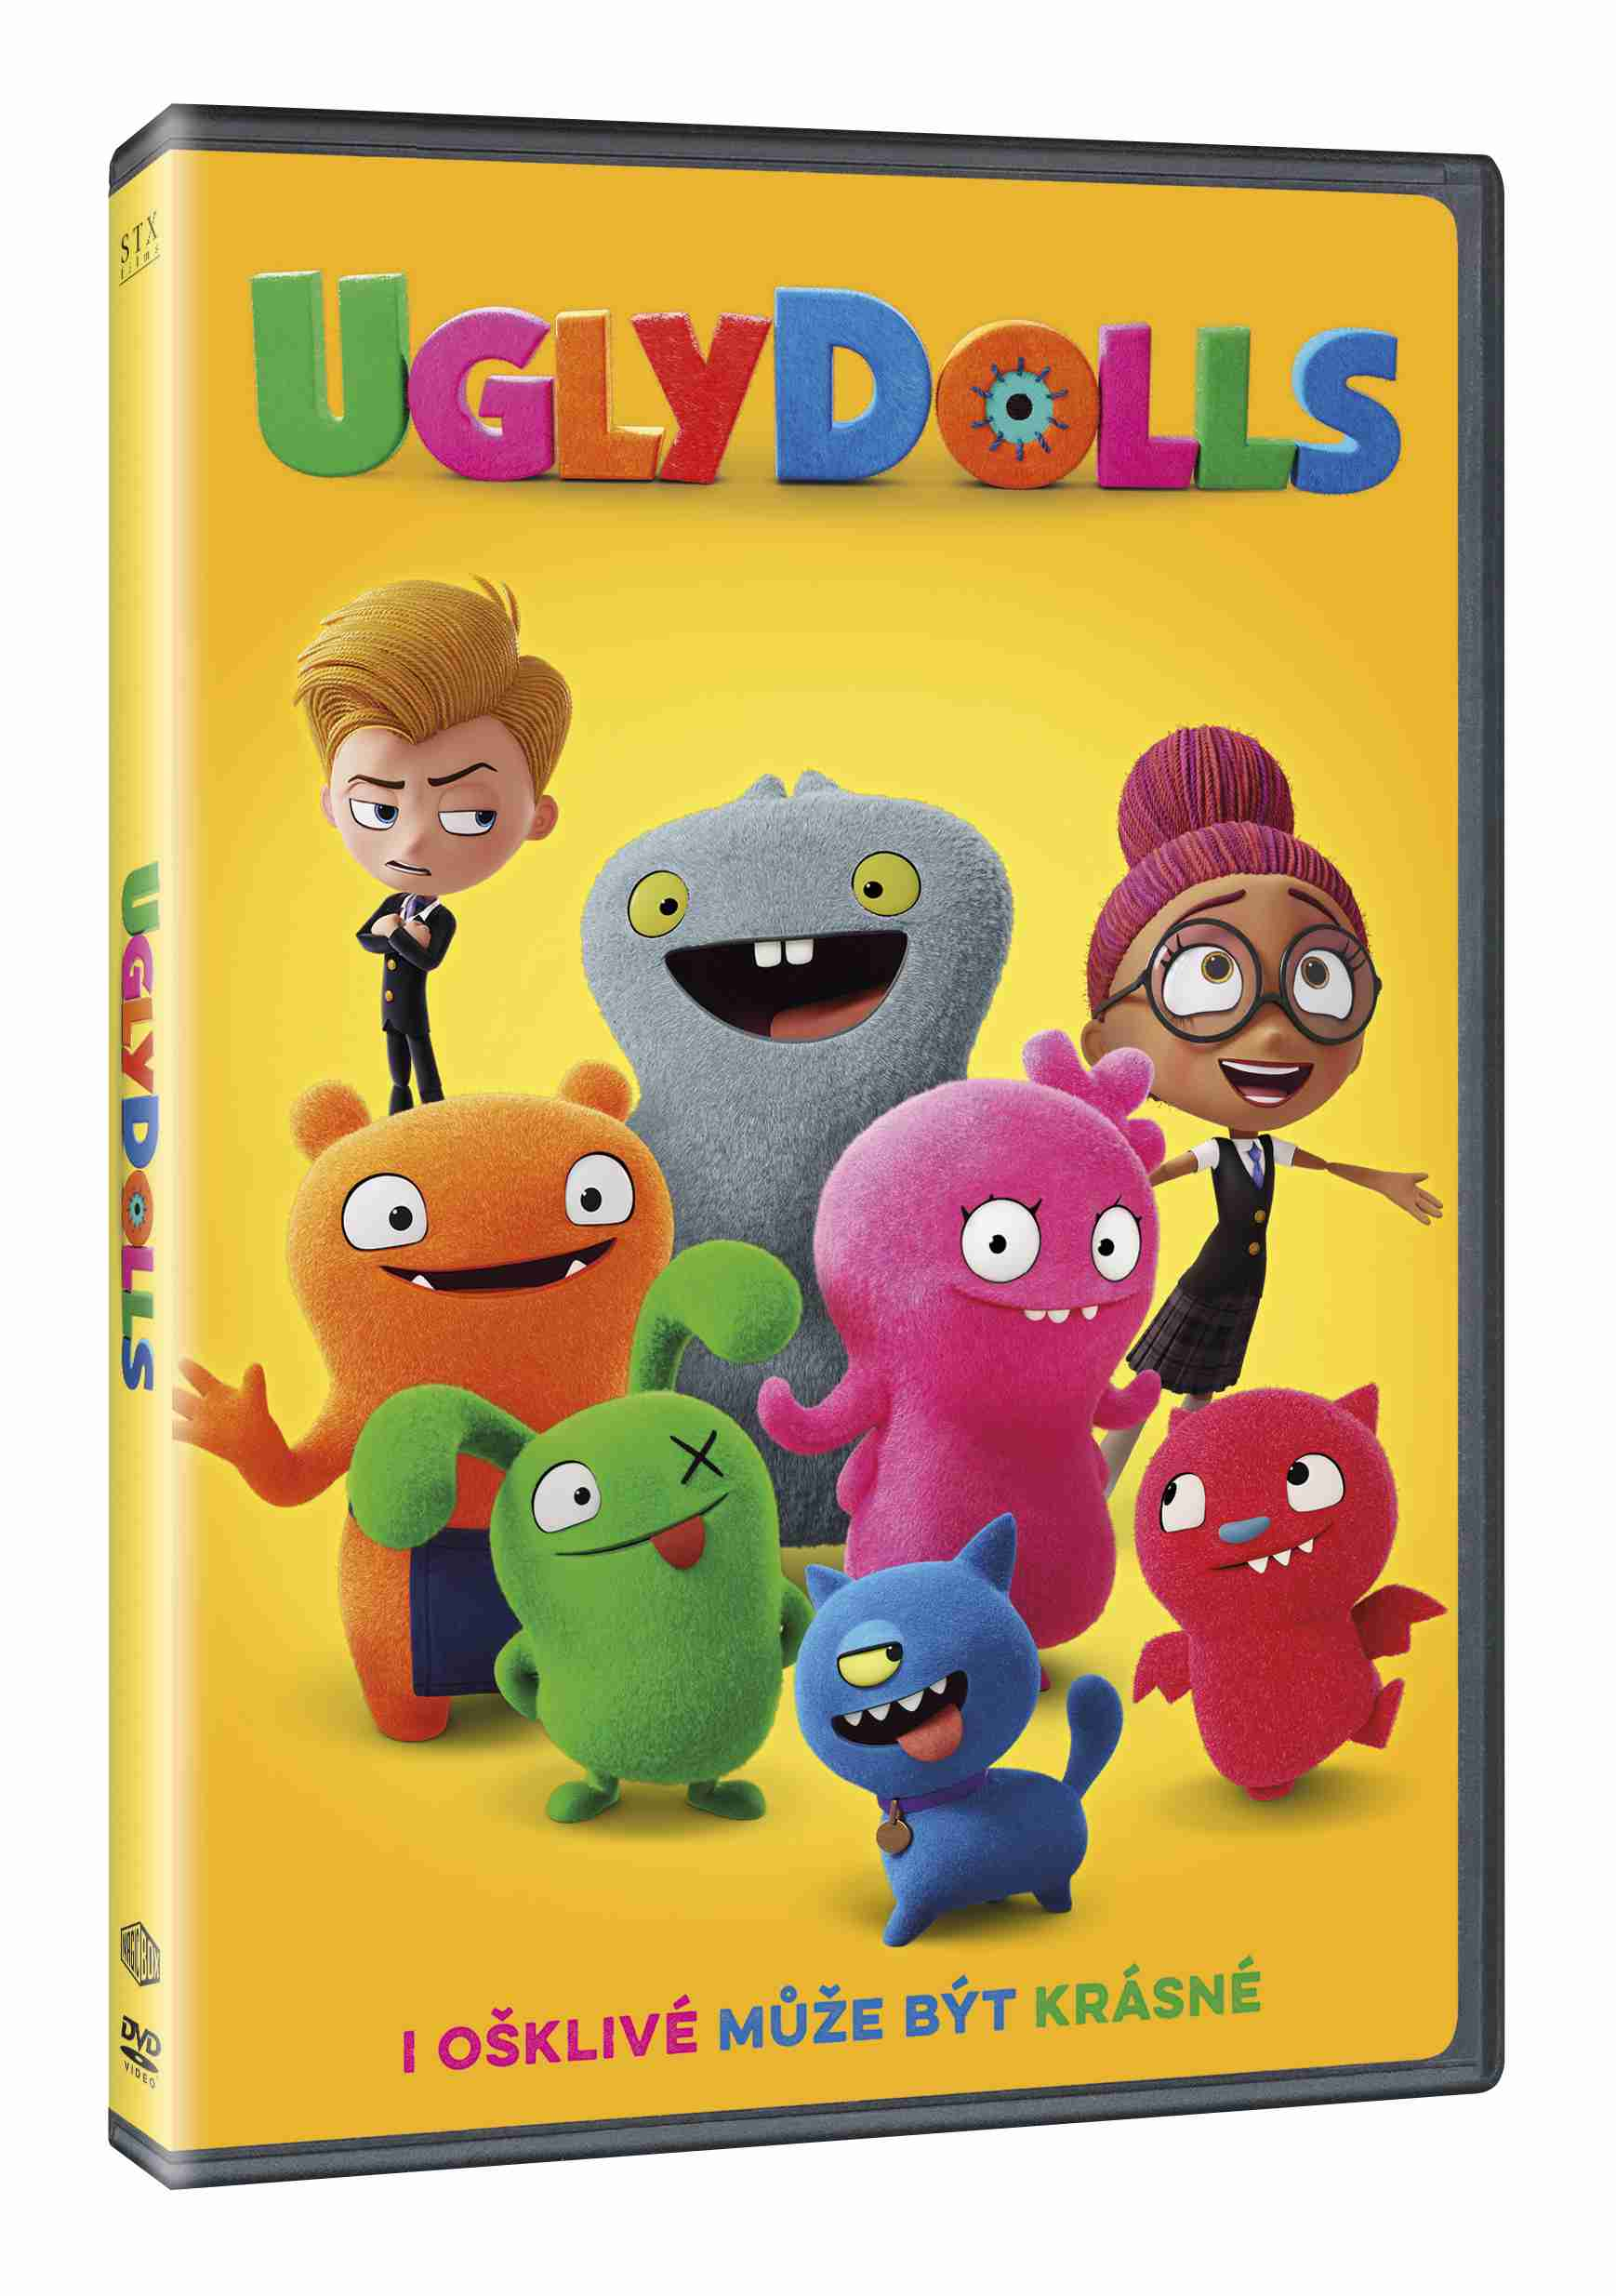 UglyDolls - DVD